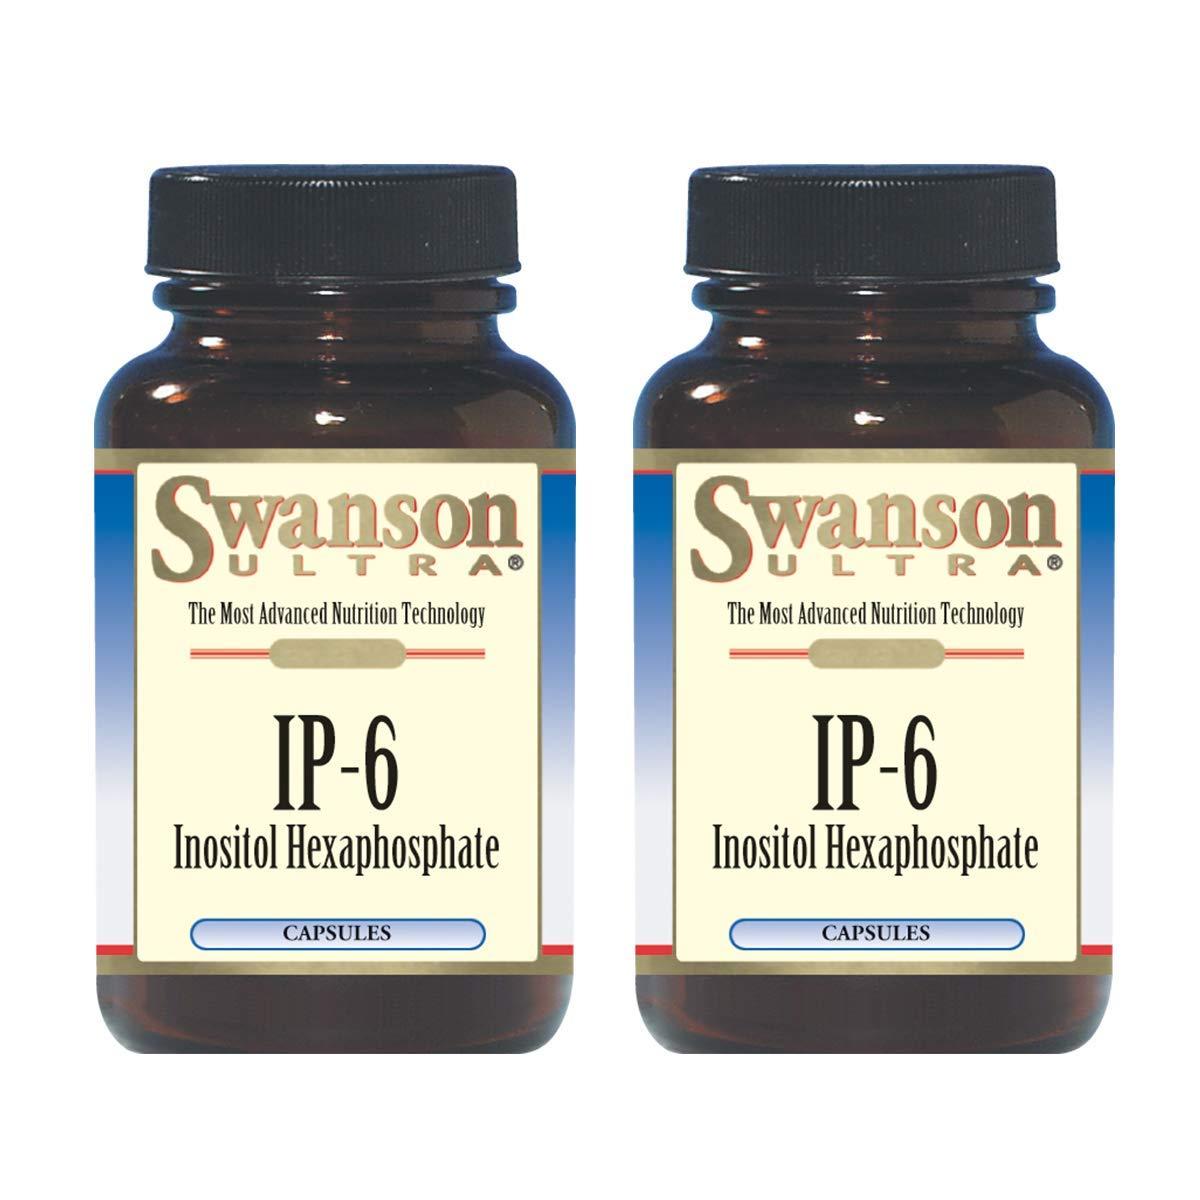 Swanson IP-6 Inositol Hexaphosphate 240 Capsules (2 Pack) by Swanson